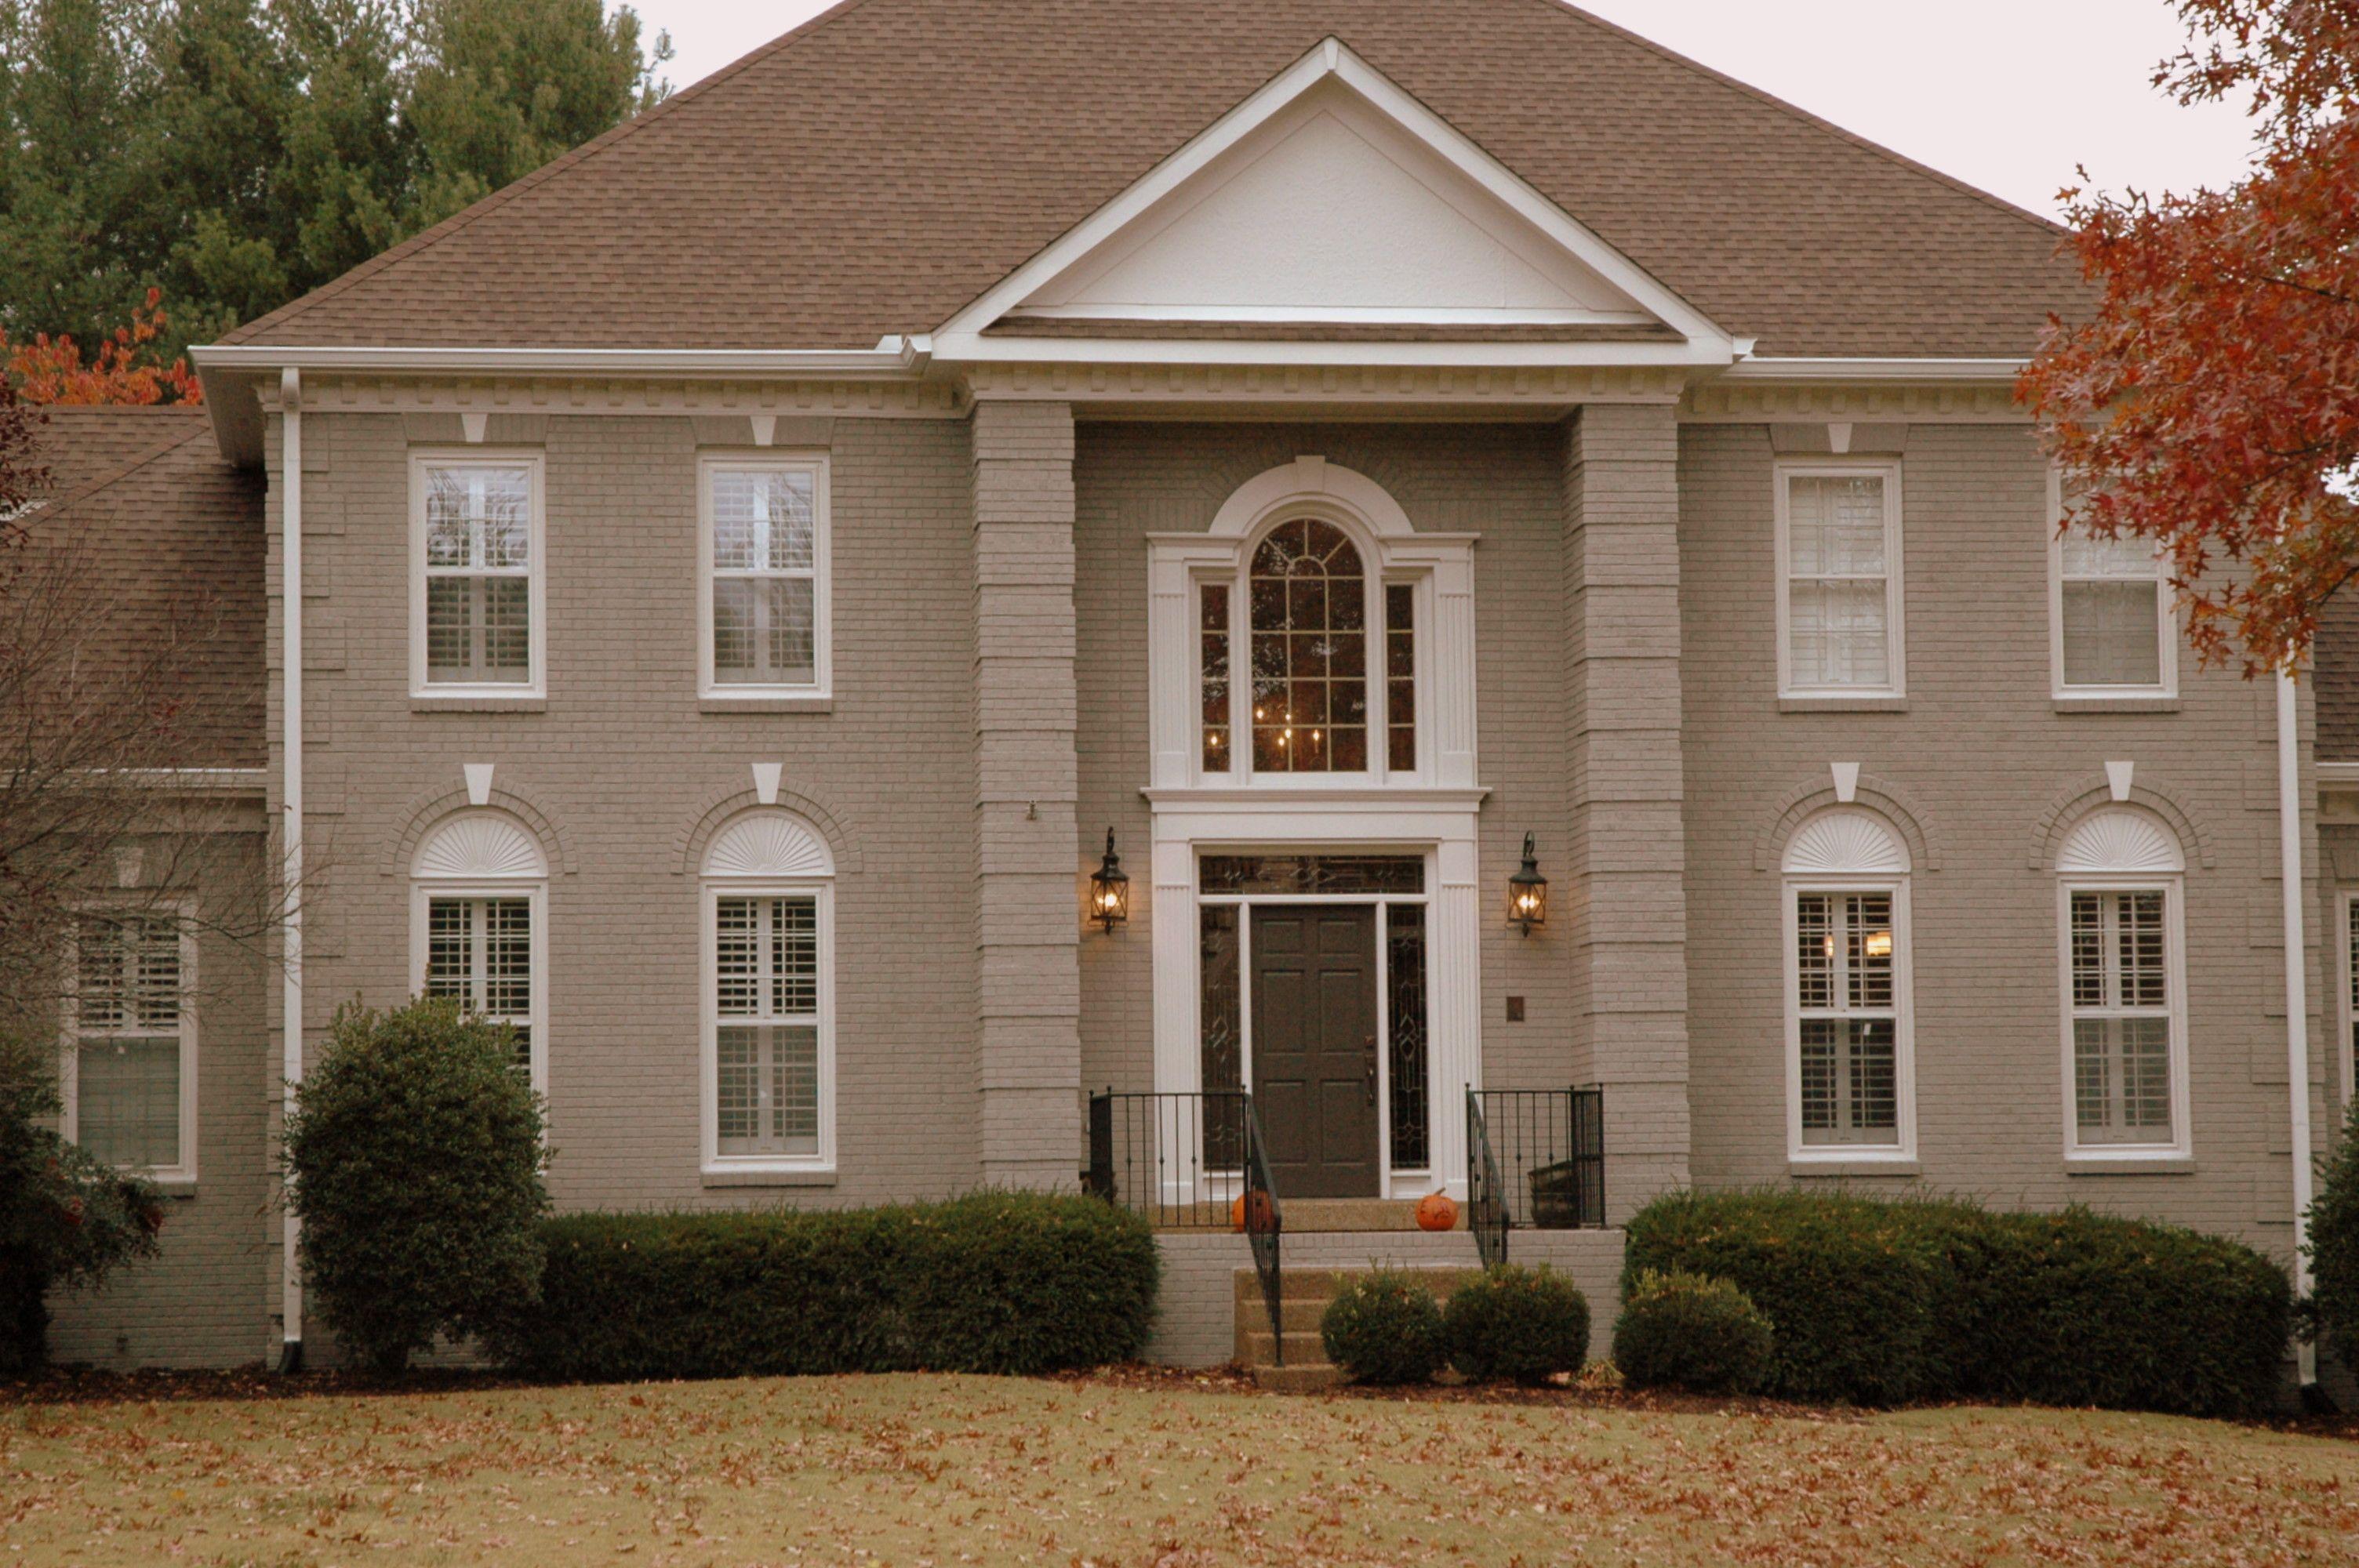 Terrific Painted Brick Facade Exterior Paint Color With Black Door Largest Home Design Picture Inspirations Pitcheantrous